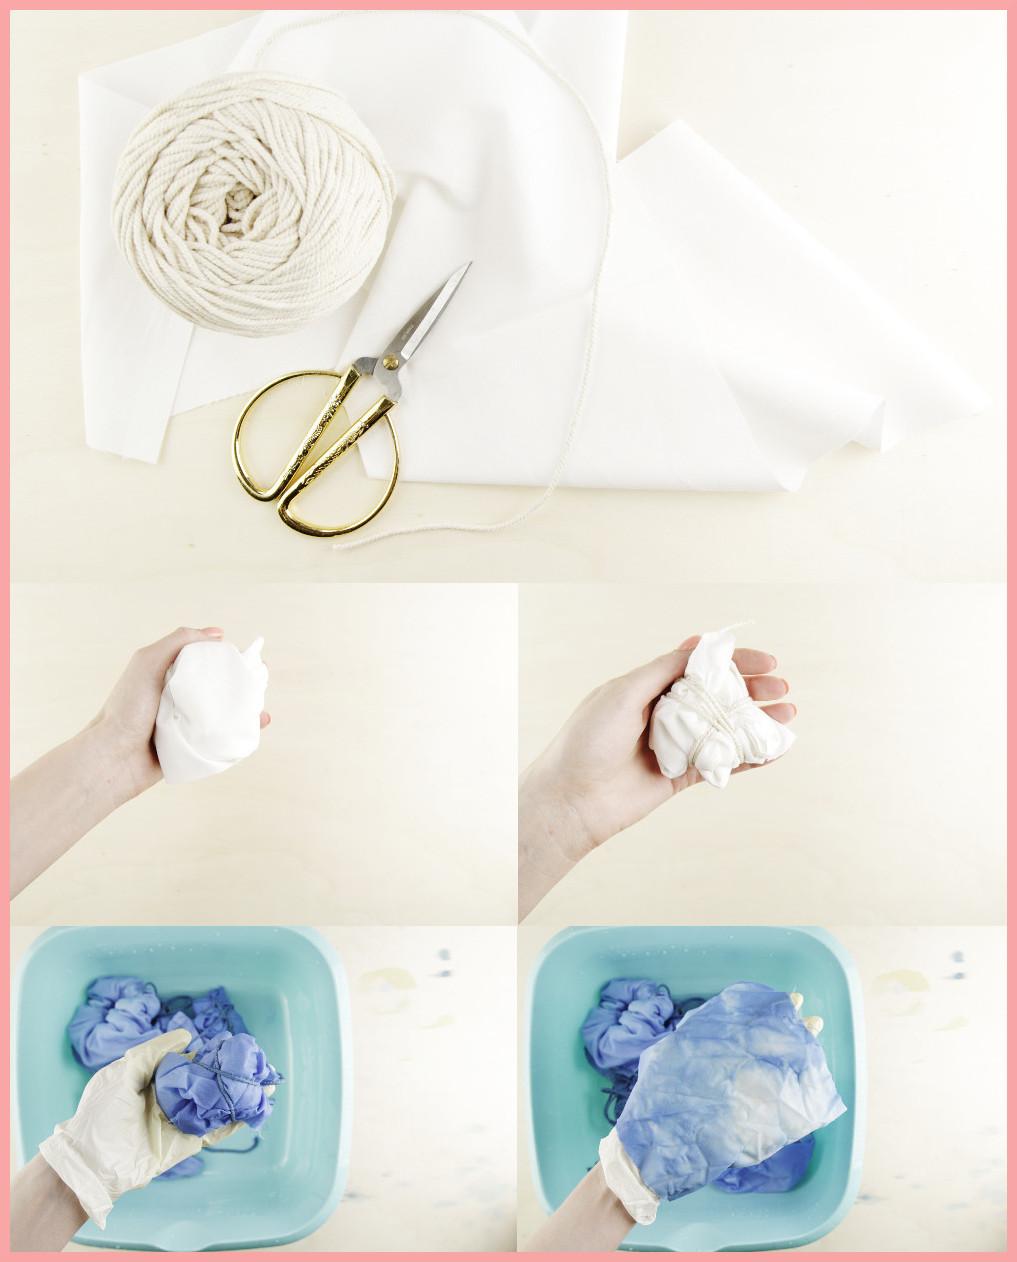 stirnband selber machen ohne n hmaschine frau friemel. Black Bedroom Furniture Sets. Home Design Ideas